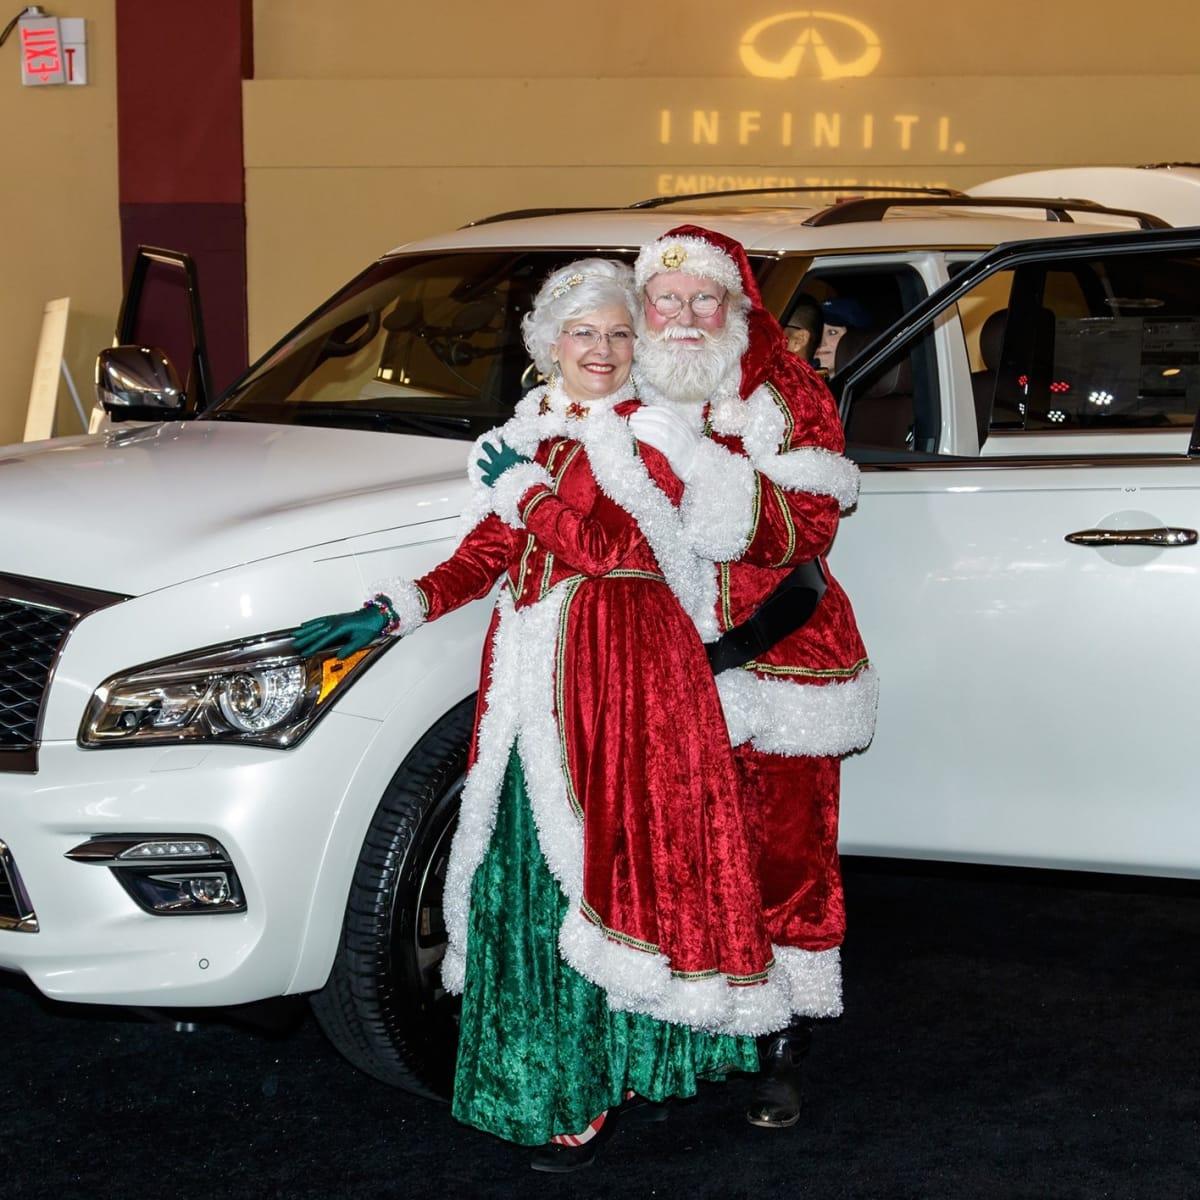 Santa, Infiniti, CultureMap Dallas Holiday Pop-up 2017